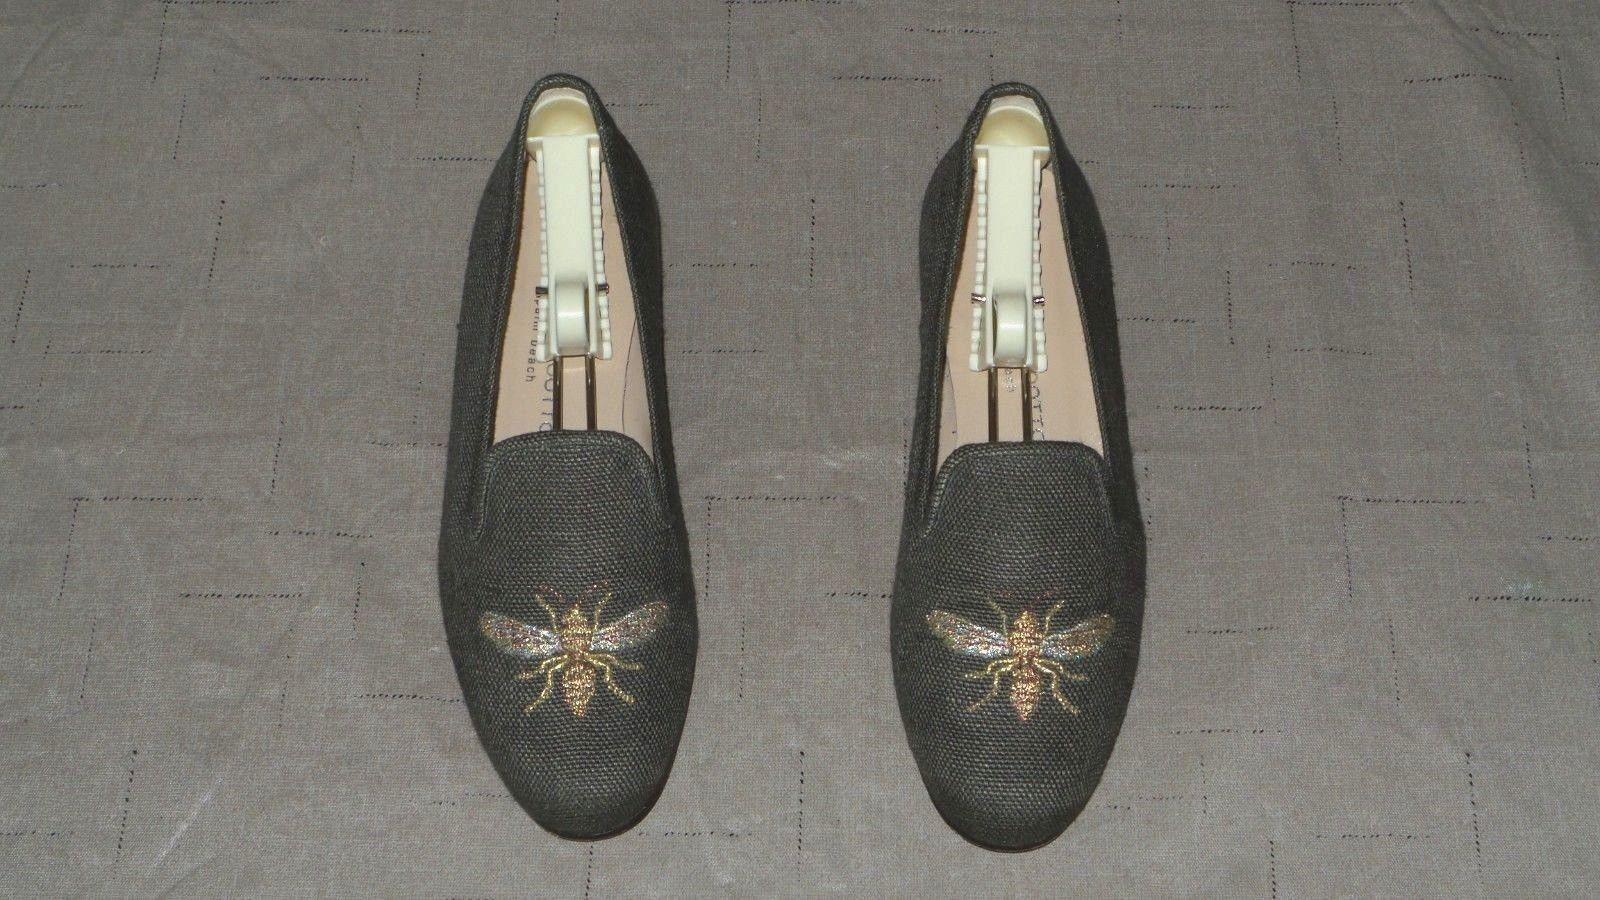 marchi di stilisti economici SO CUTE   450 Stubbs and Wootton Olive Olive Olive verde Canvas  WASP  Slippers Loafers Shoe  grande sconto